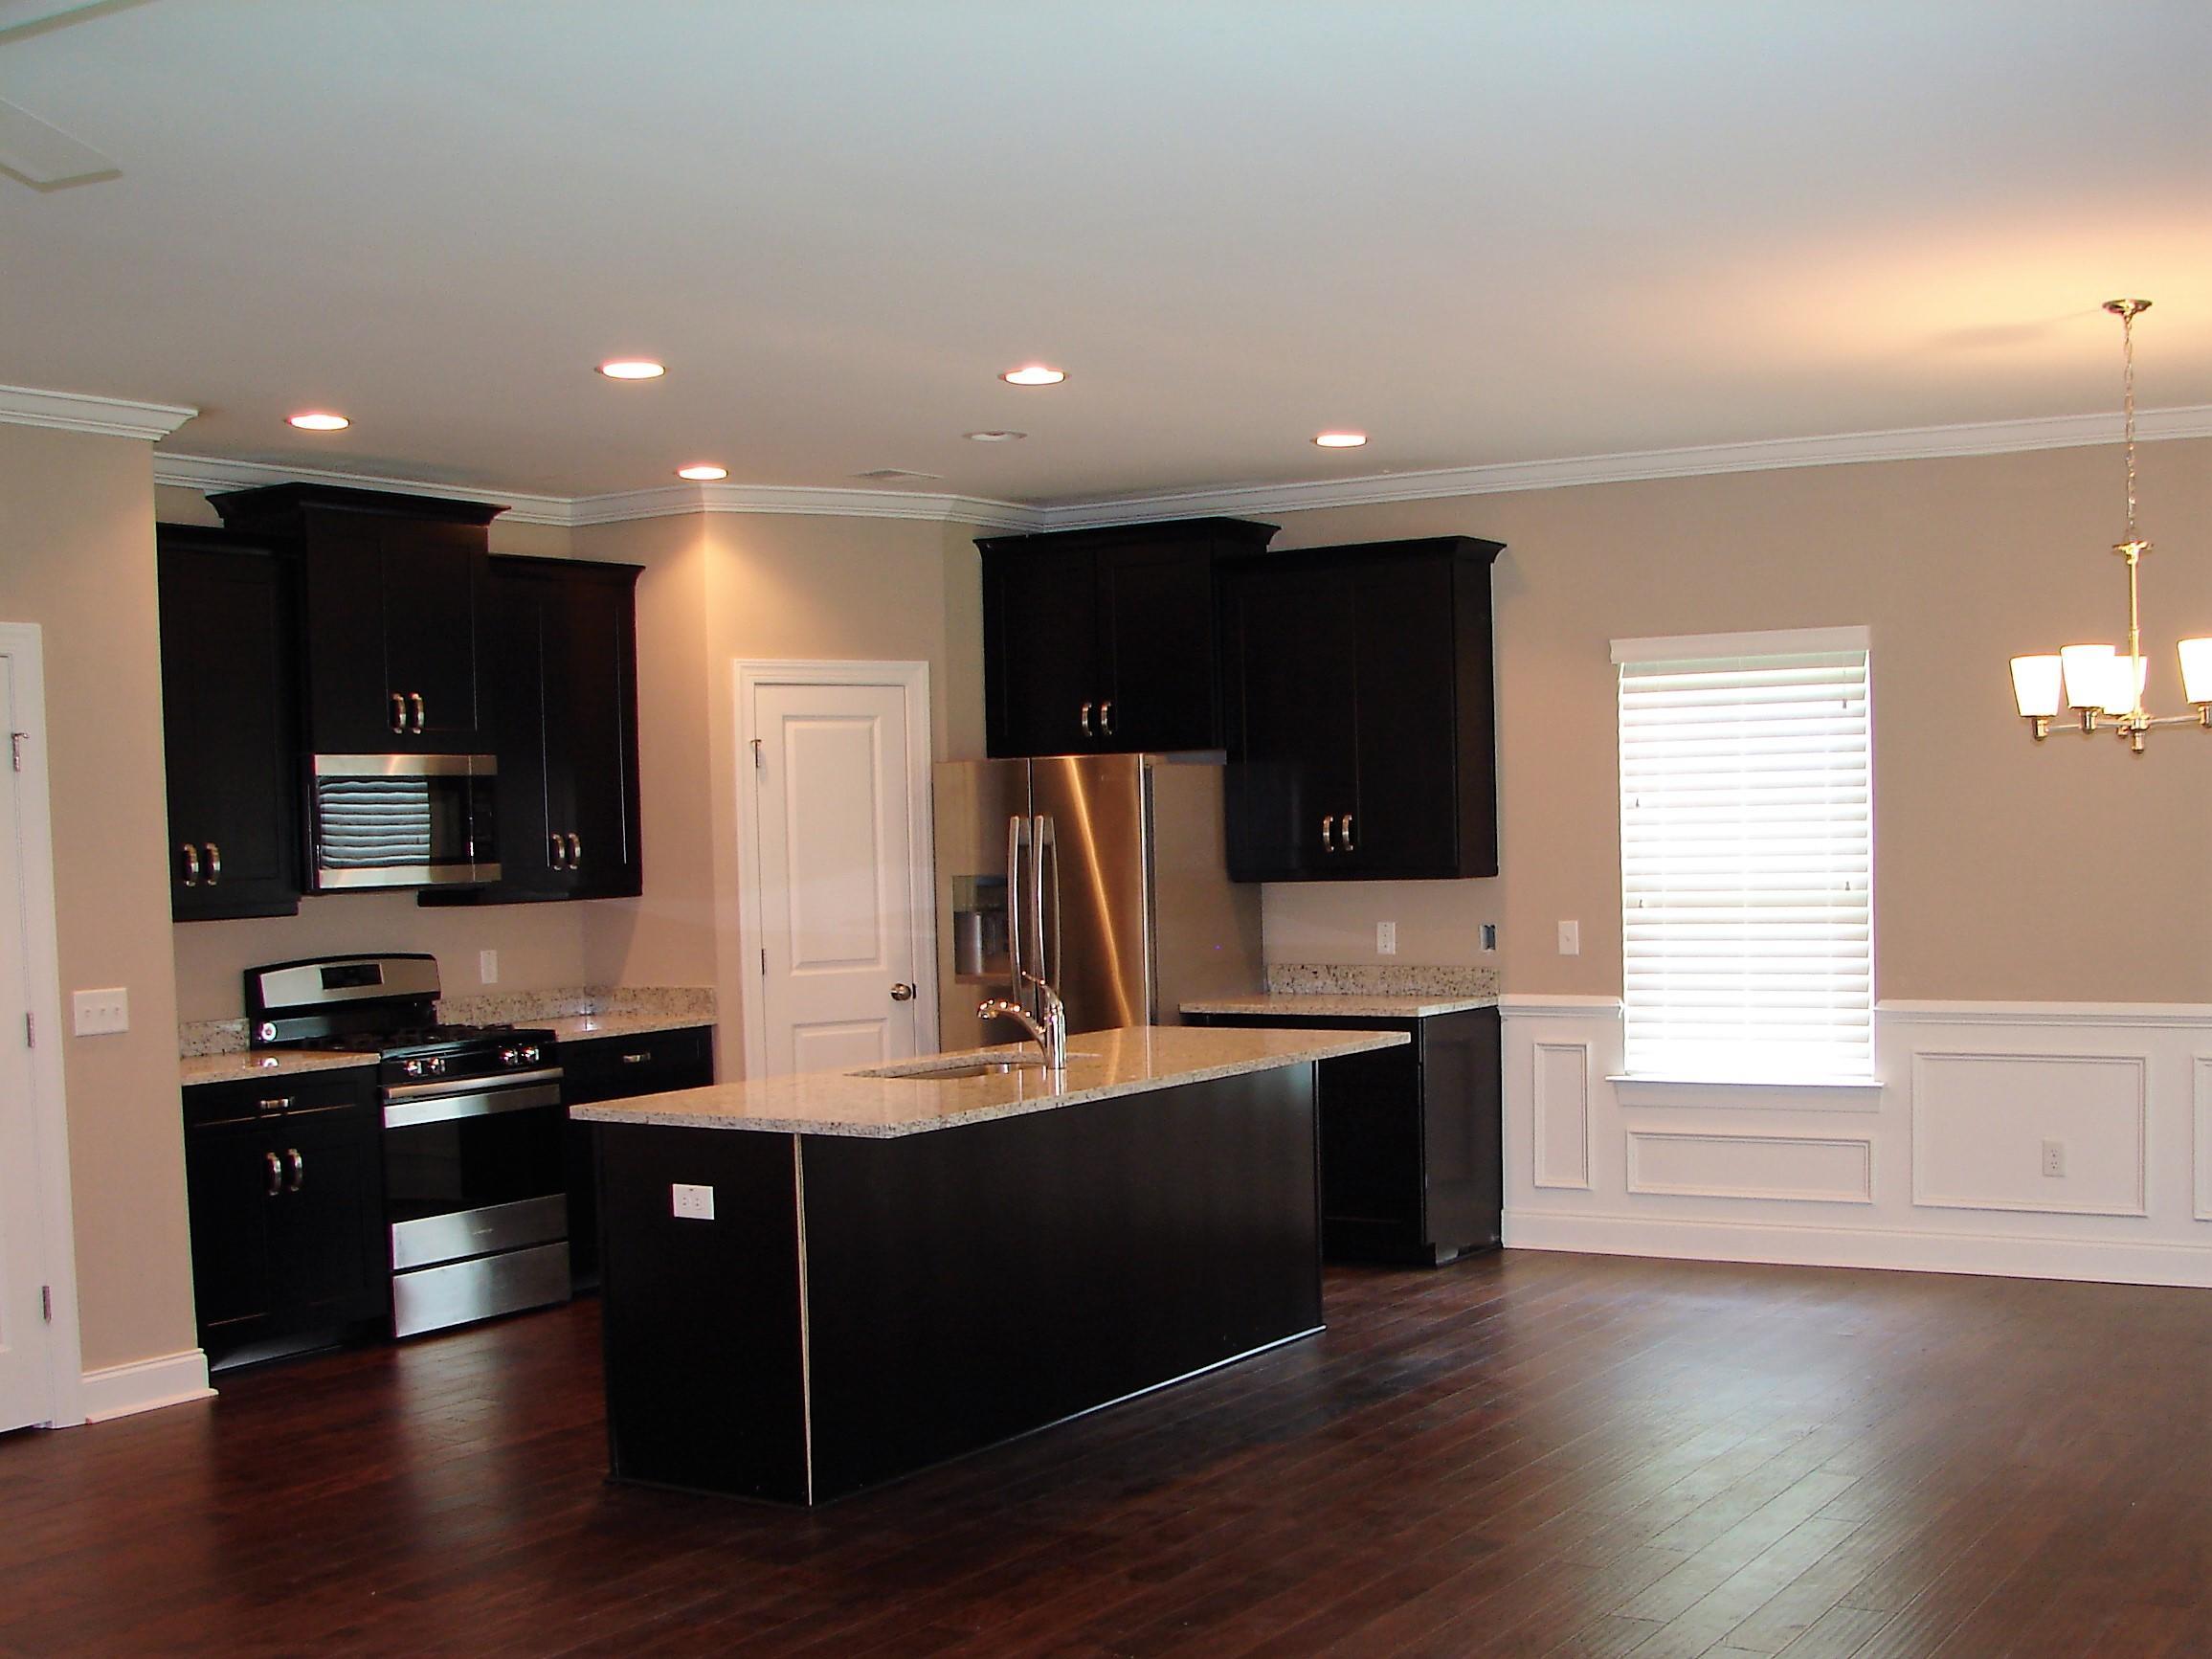 Filbin Creek Homes For Sale - 1173 Sumner, North Charleston, SC - 18